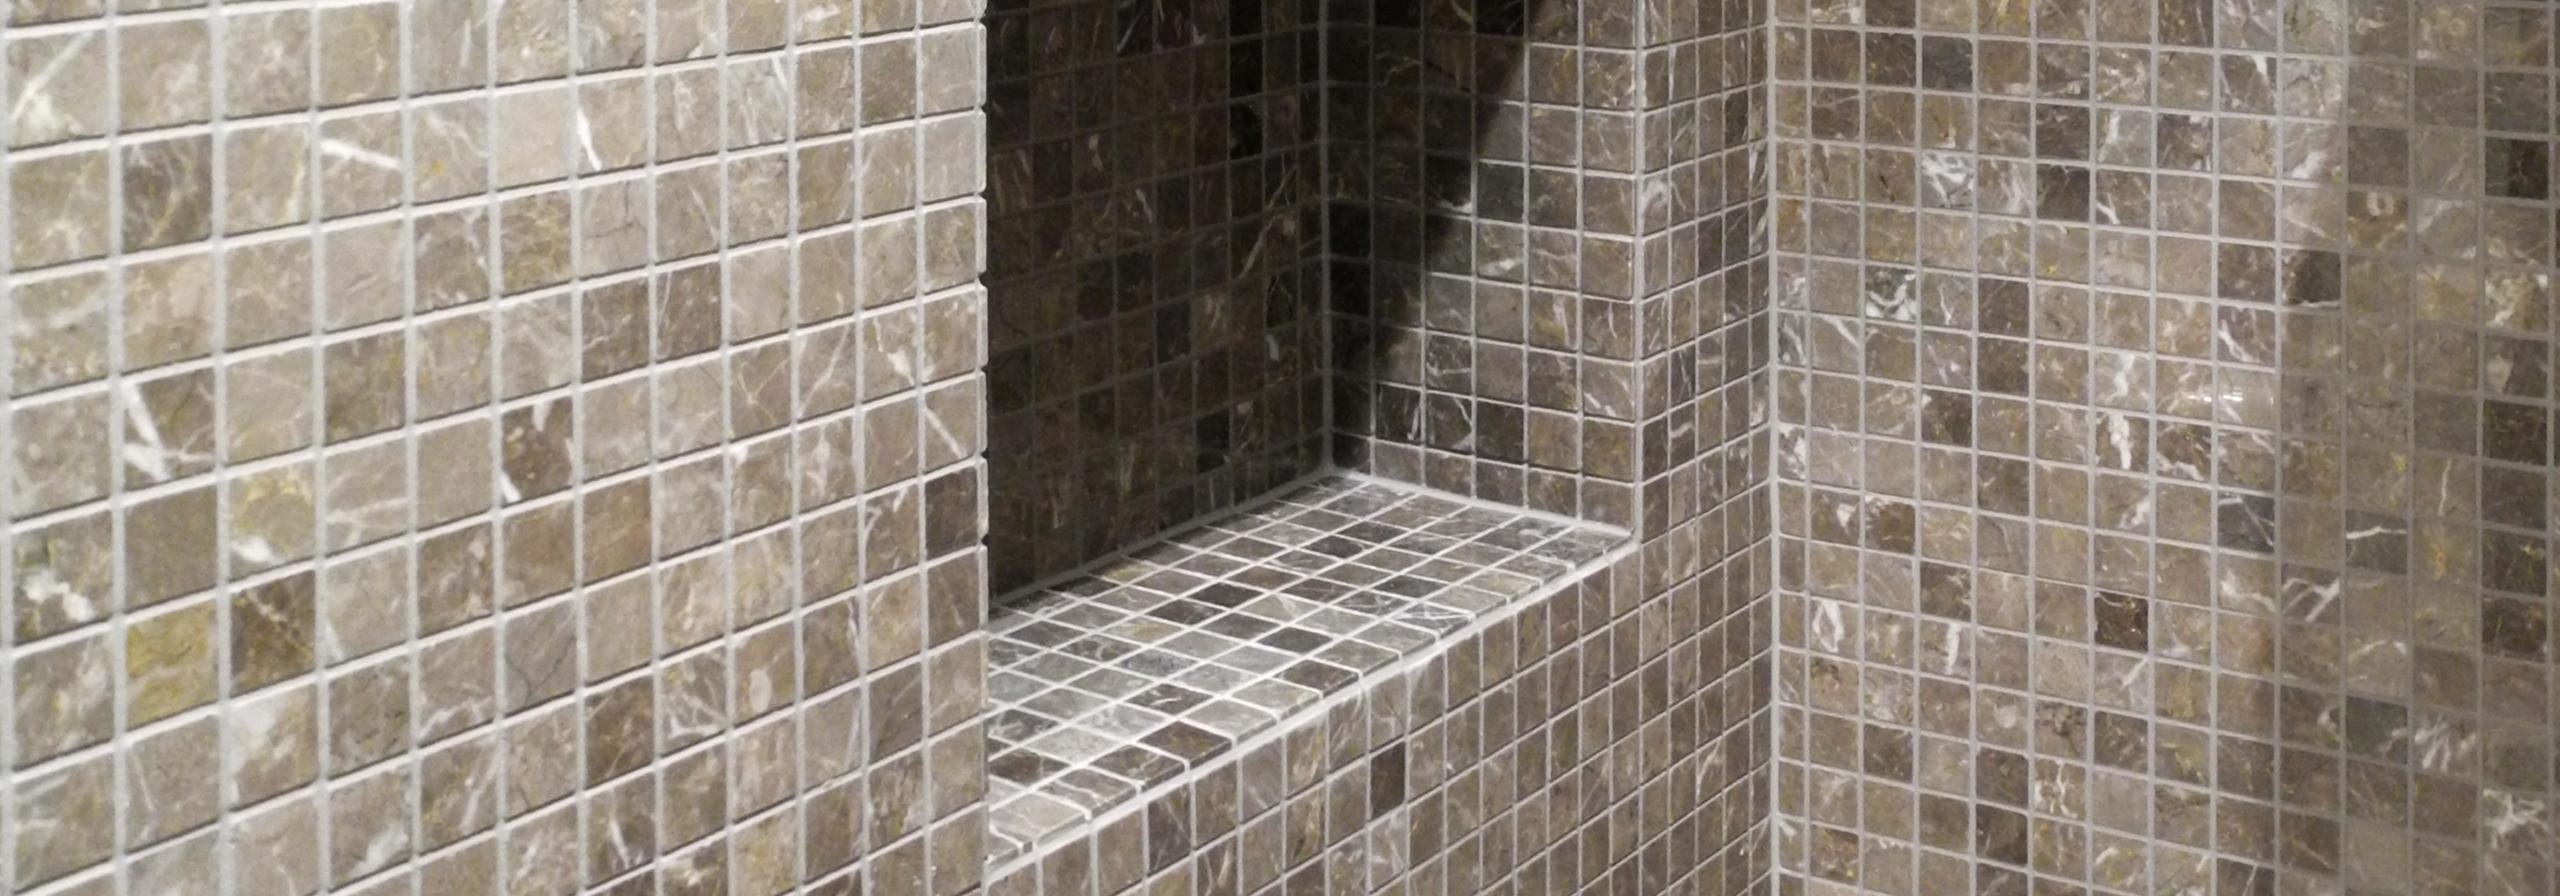 Realisatie in samenwerking met interieurarchitect Philip Thiry - 0477 24 22 14